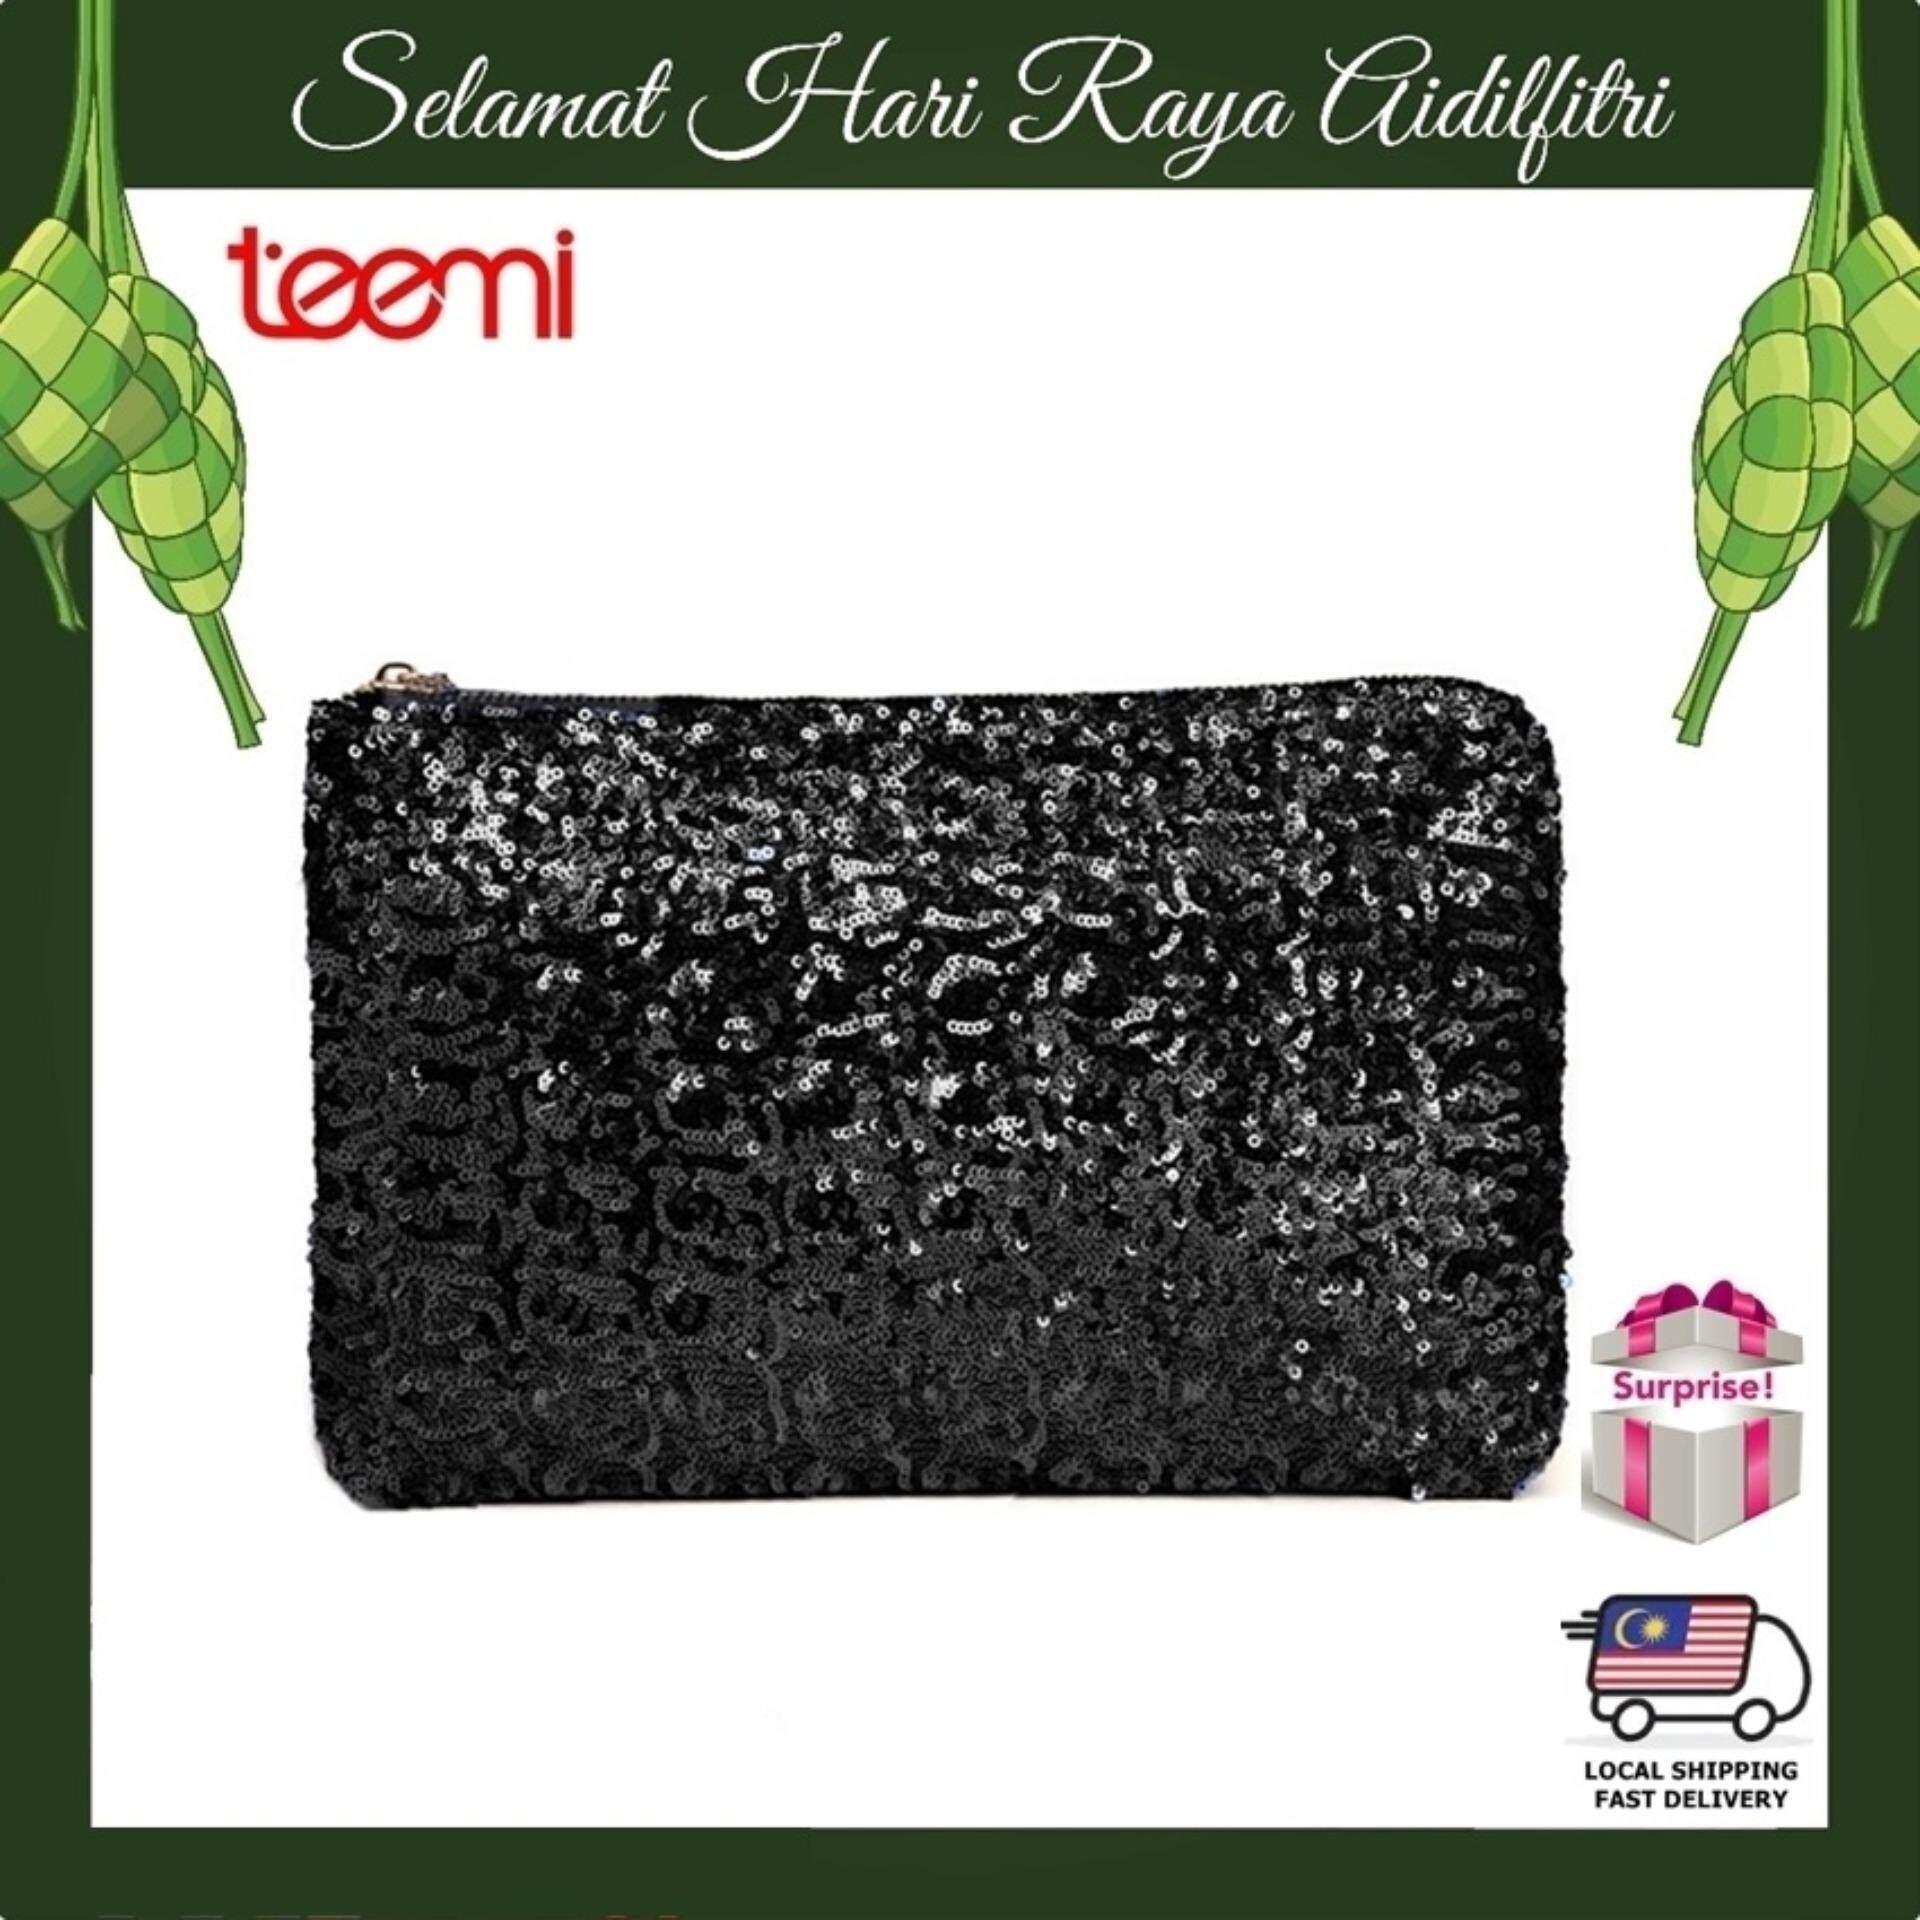 TEEMI Sequins Metallic Glitter Clutch Evening Dinner Purse Women HandBag Dazzling Sparkling Party Bag - Black